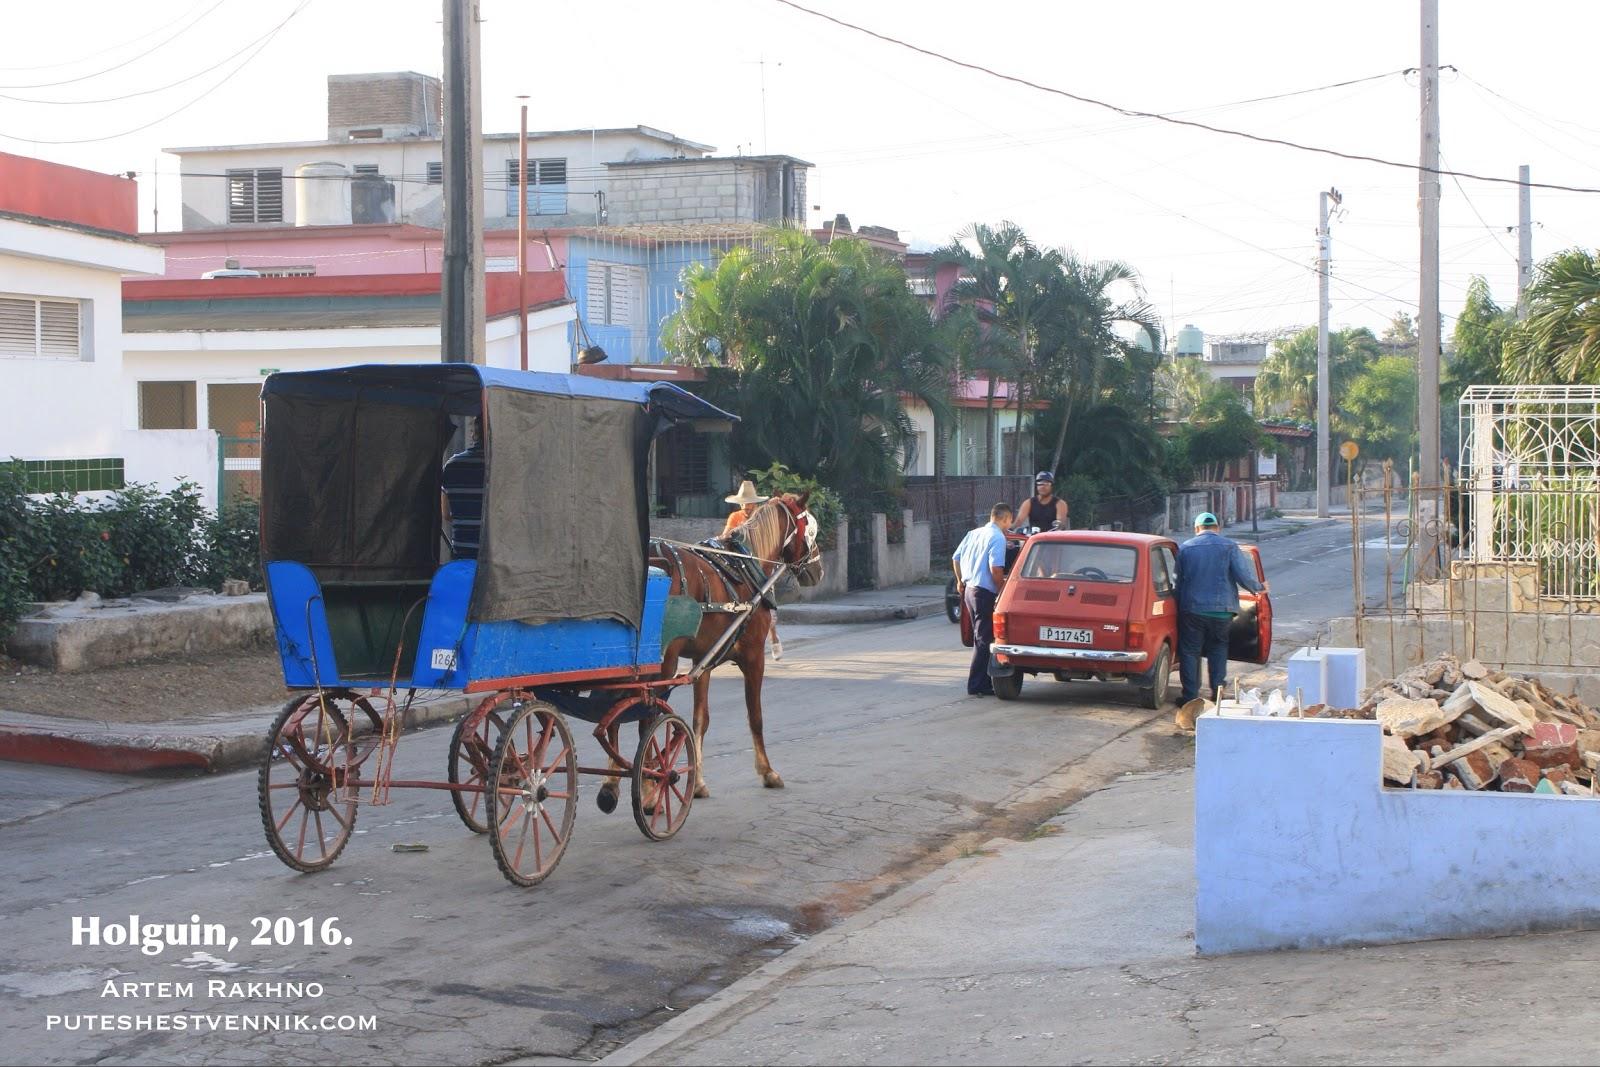 Повозка с лошадью и русская машина Нива